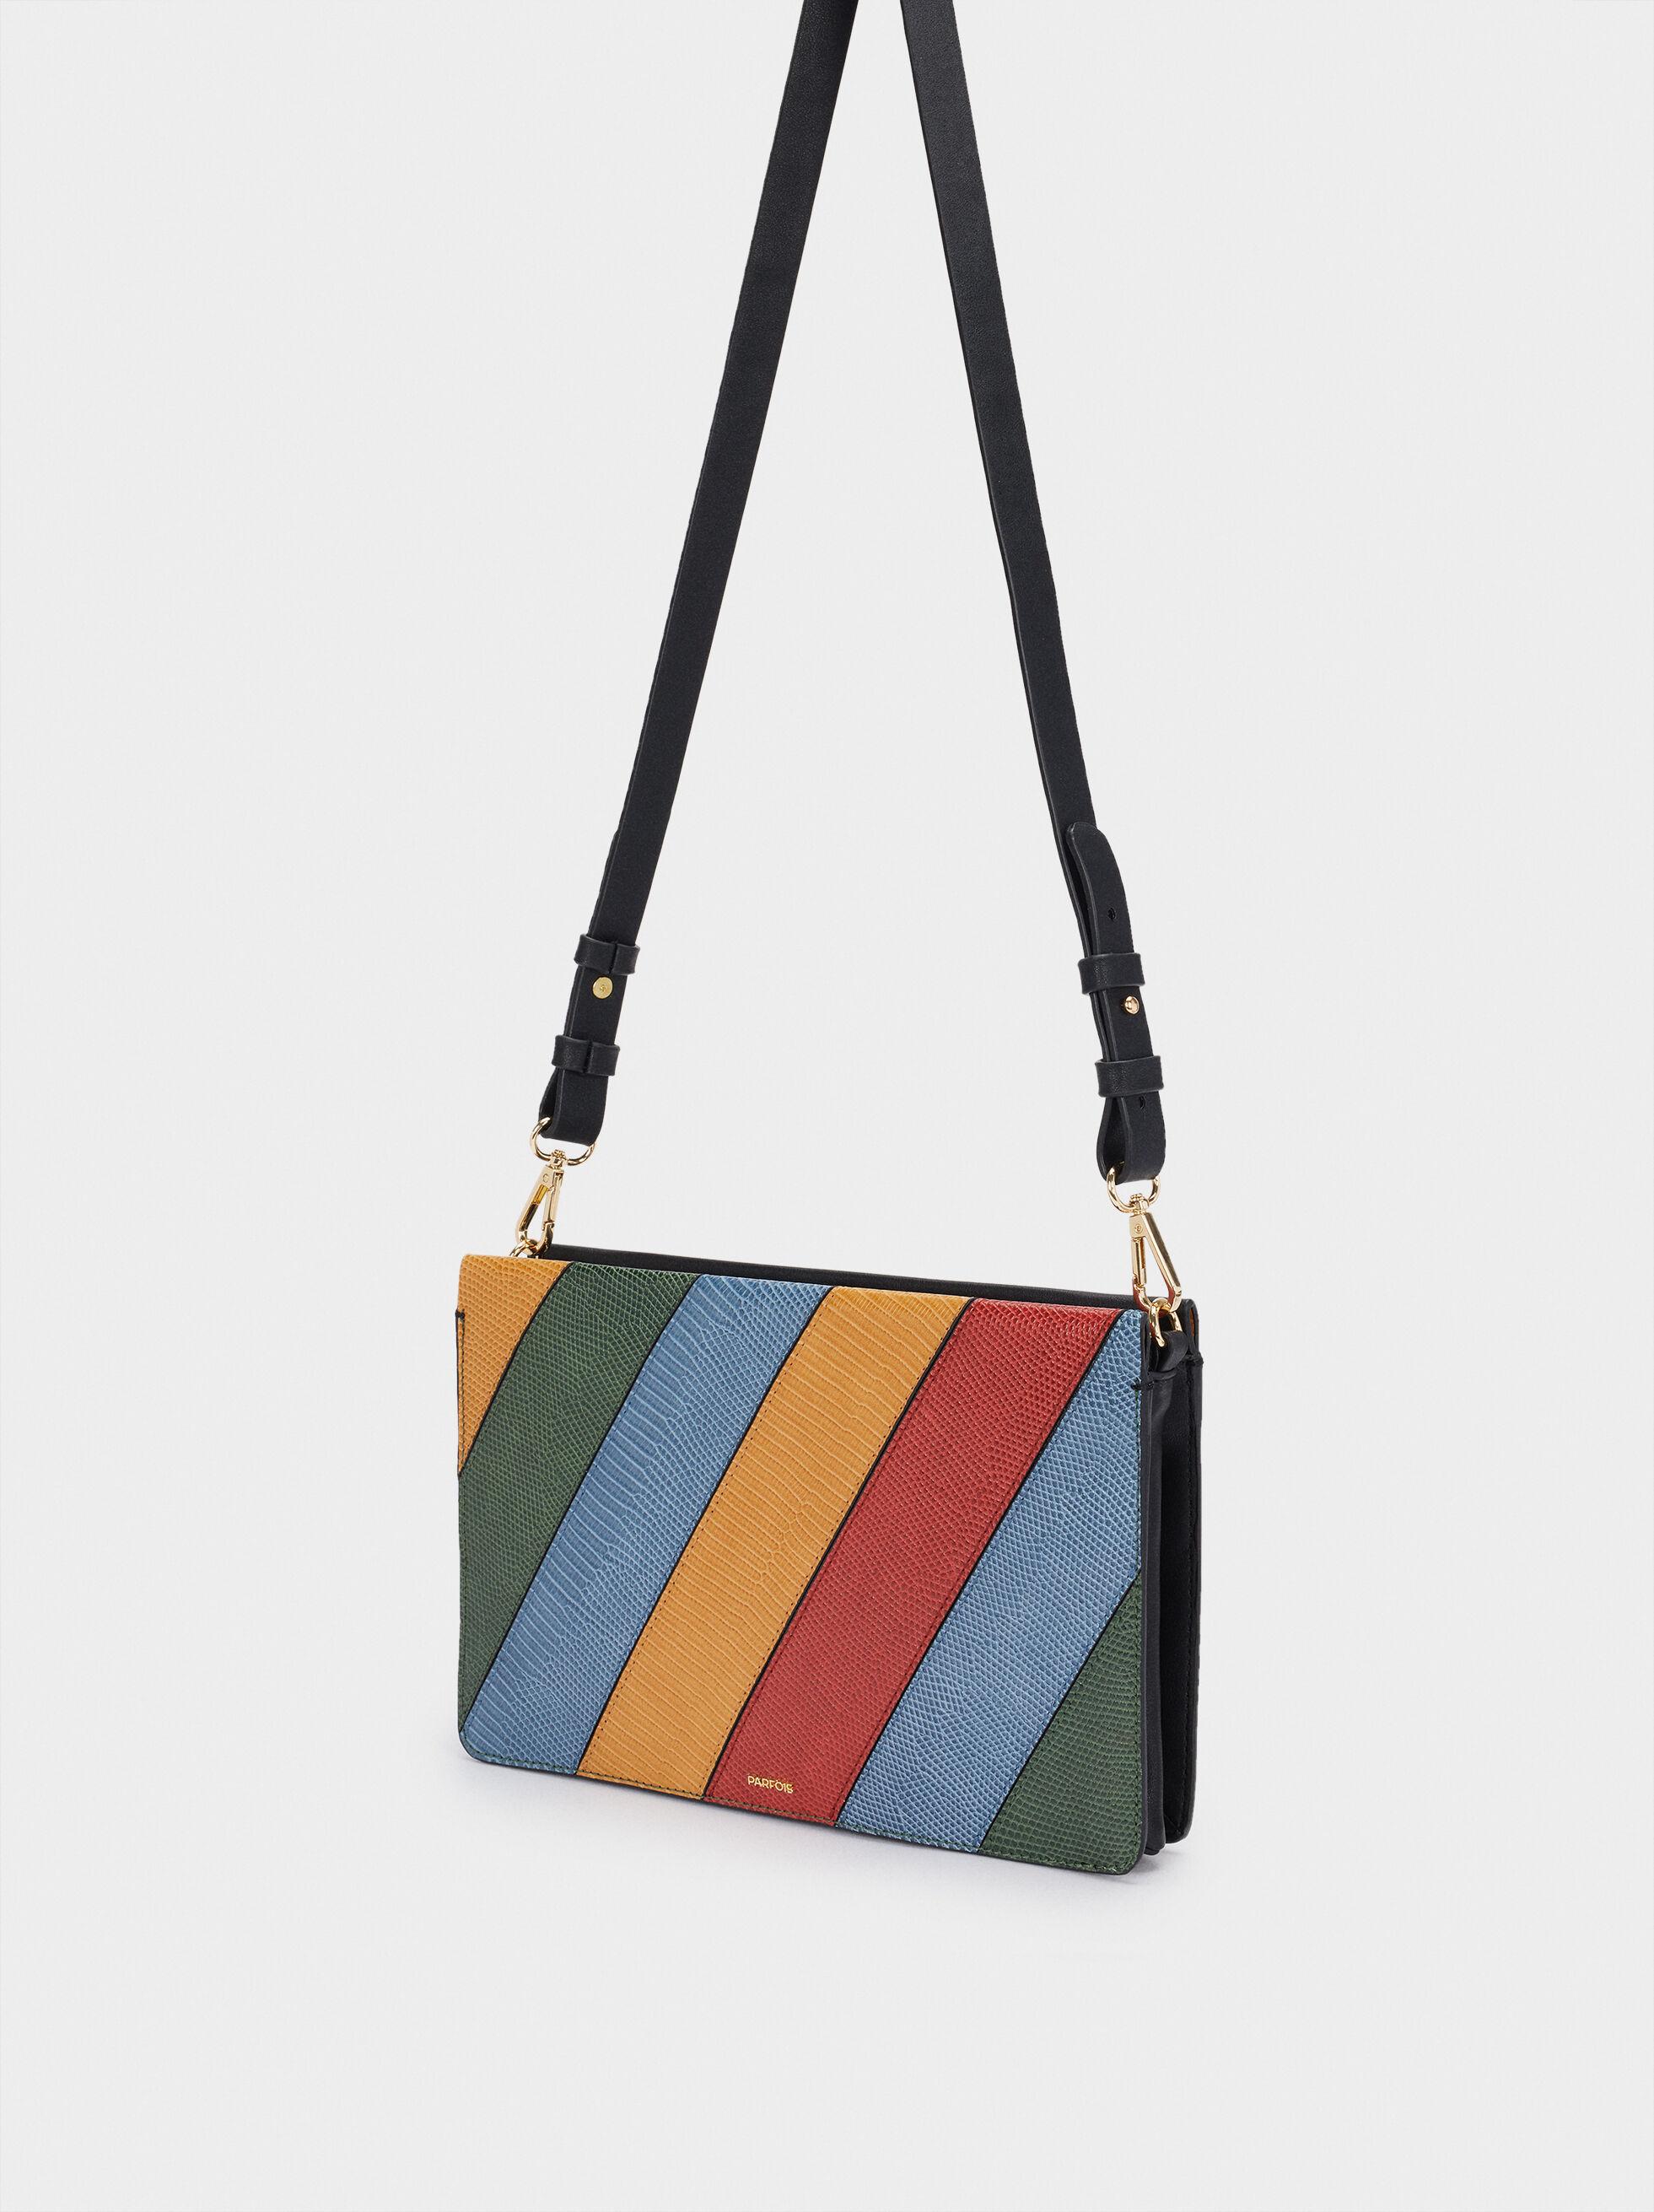 Patchwork Design Handbag, Black, hi-res